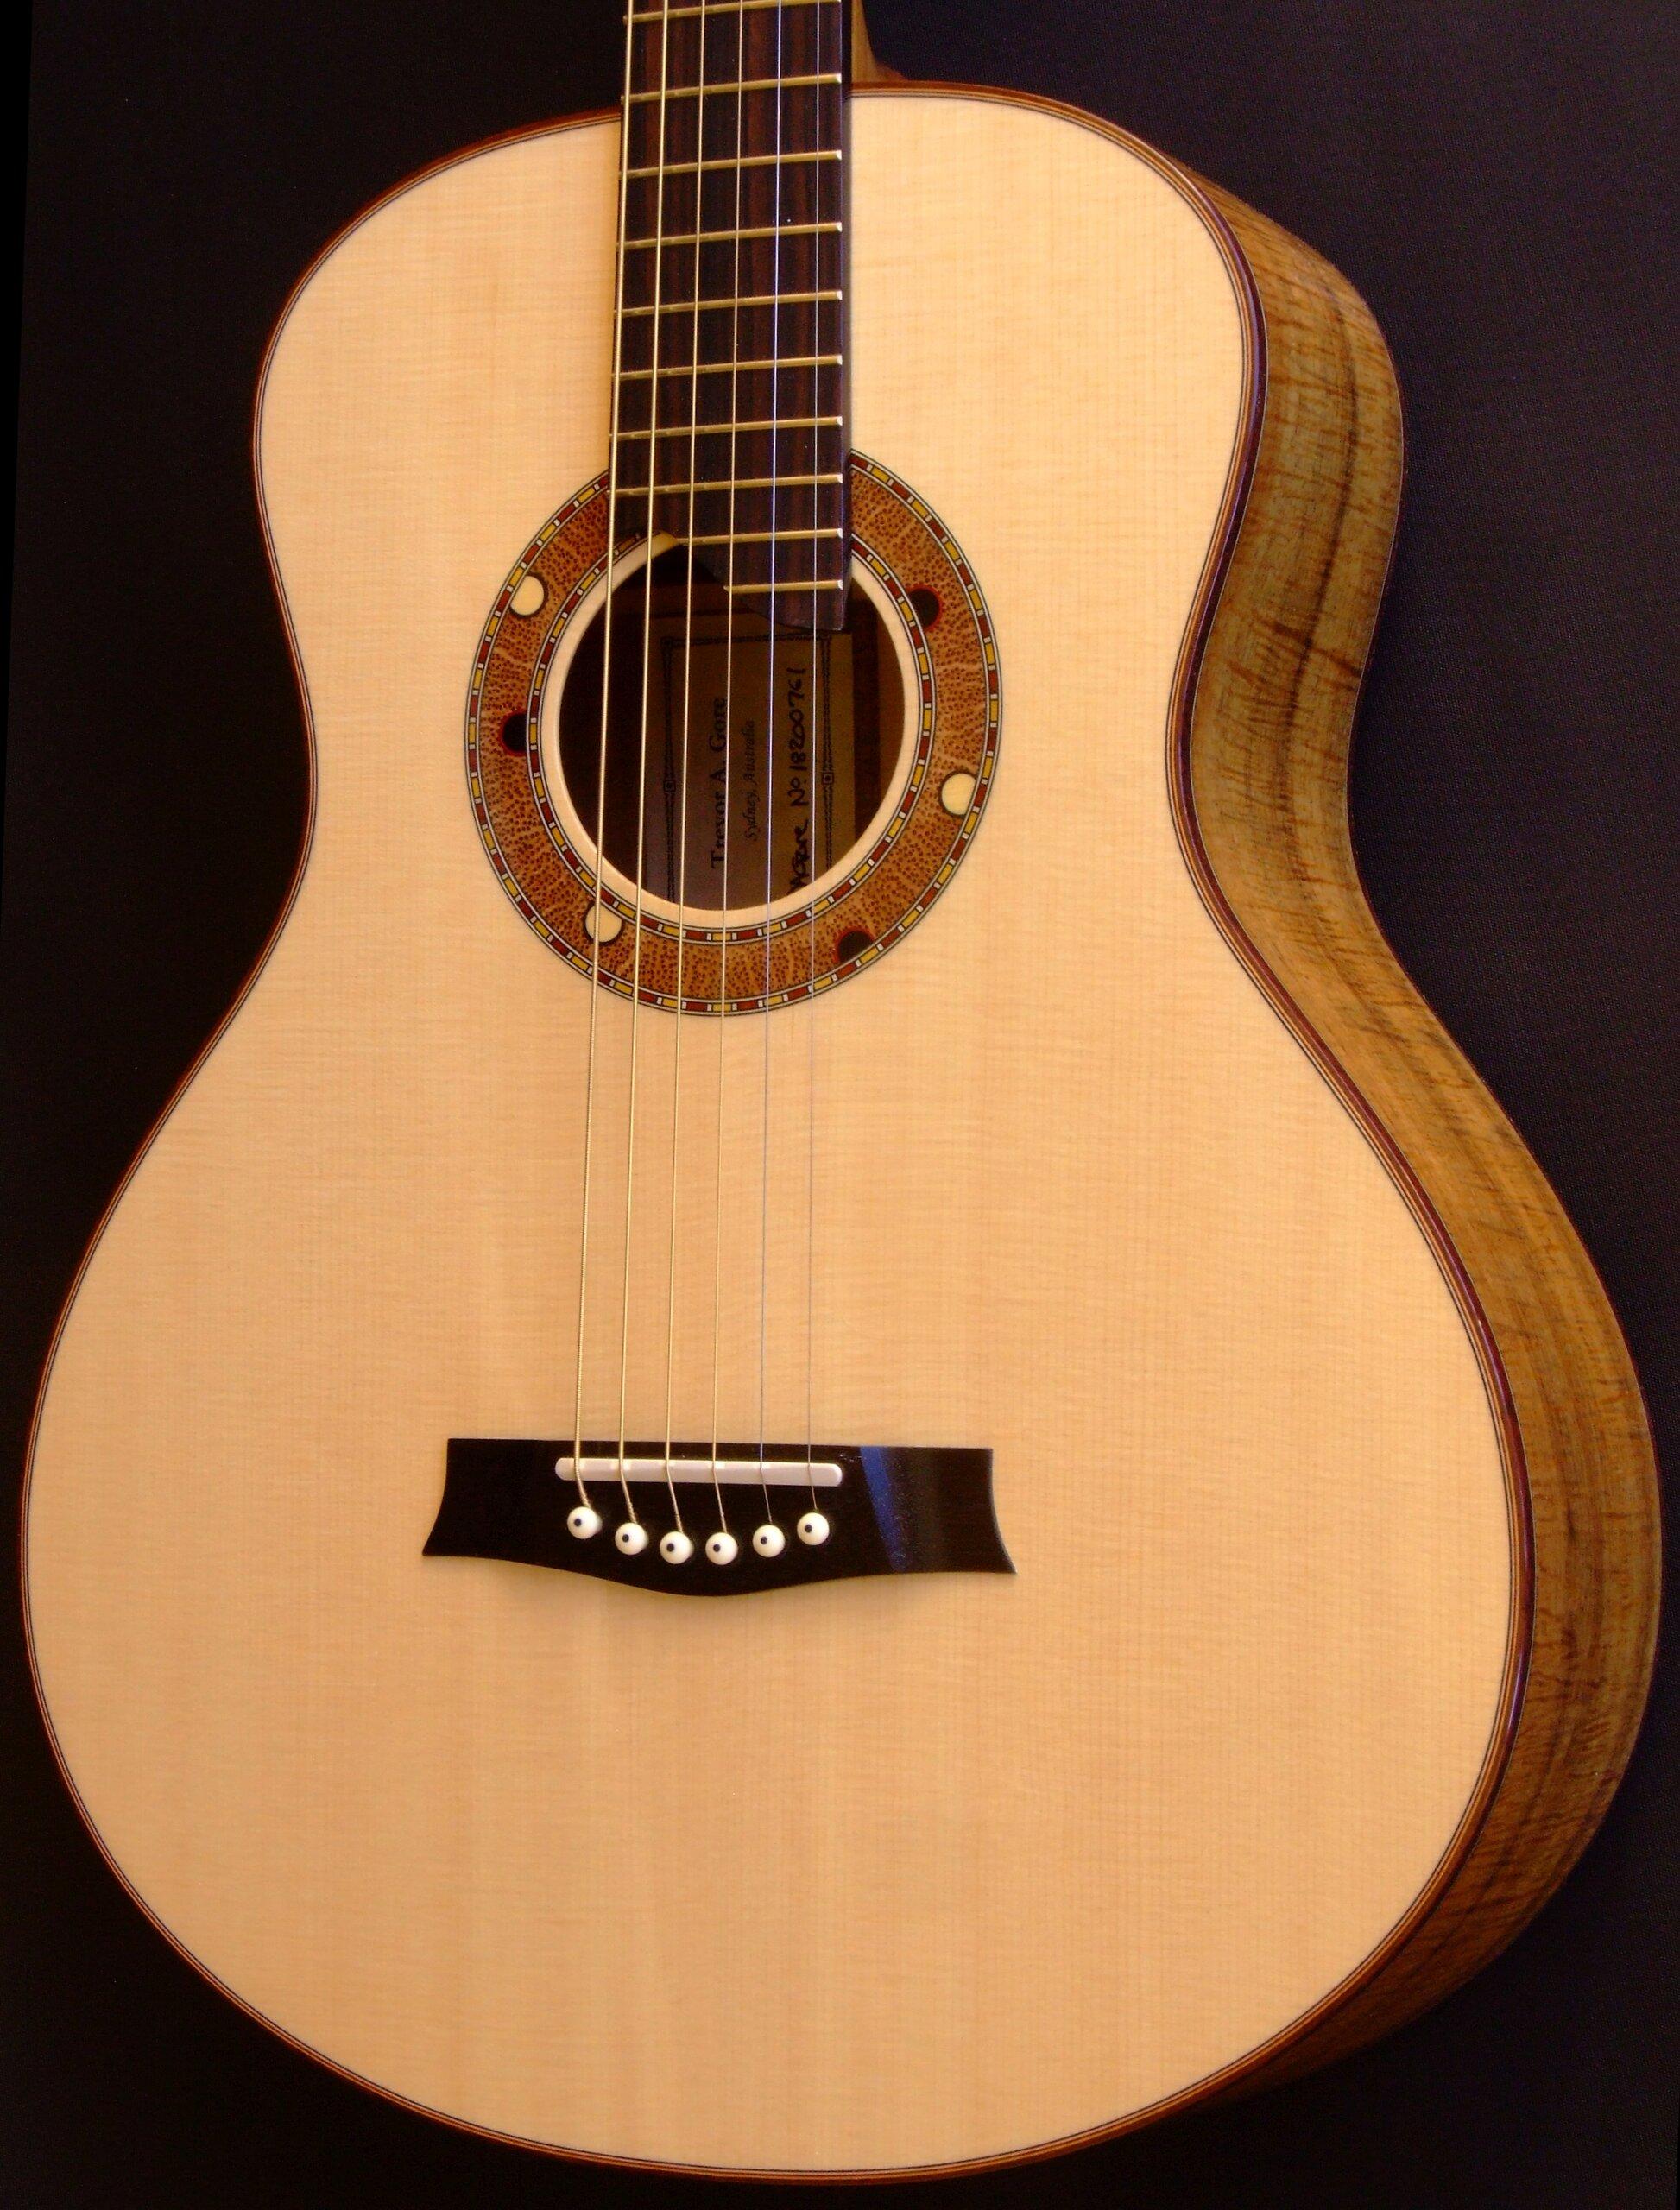 Guitar with medium retro body shape and Australiana decoration